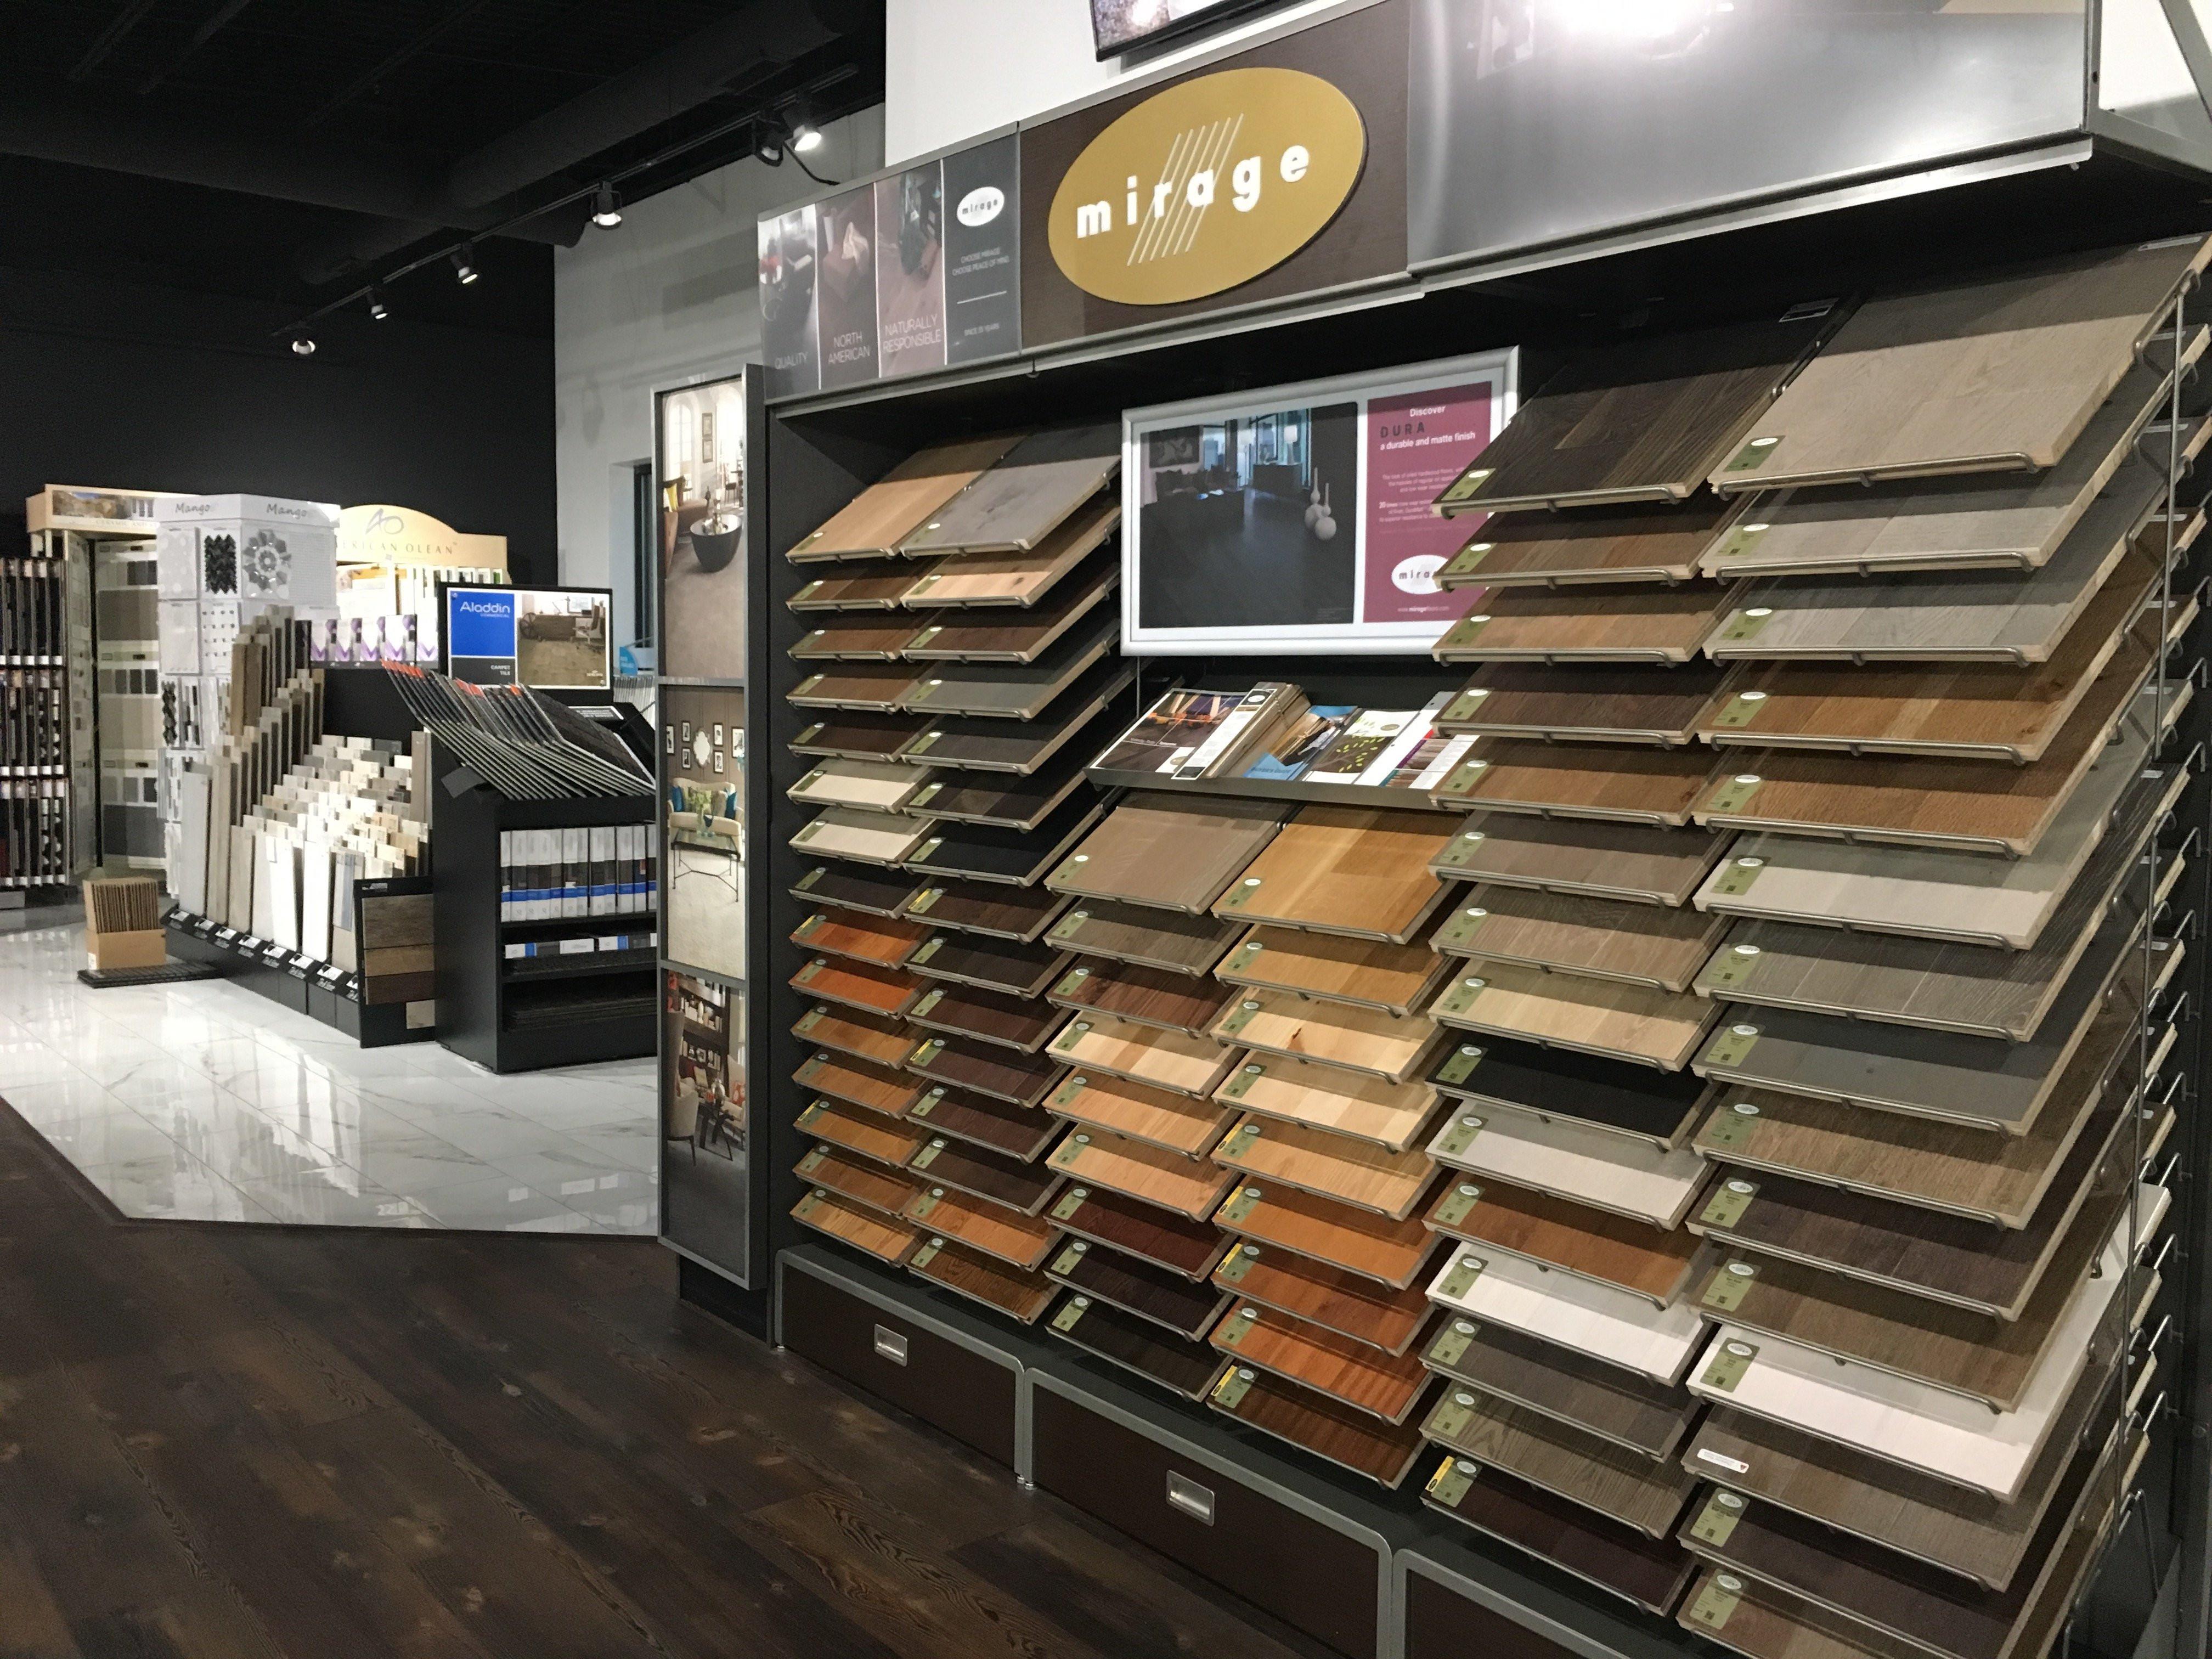 discount hardwood flooring illinois of hardwood flooring mokena mirage floors dealer creative carpet within get directions